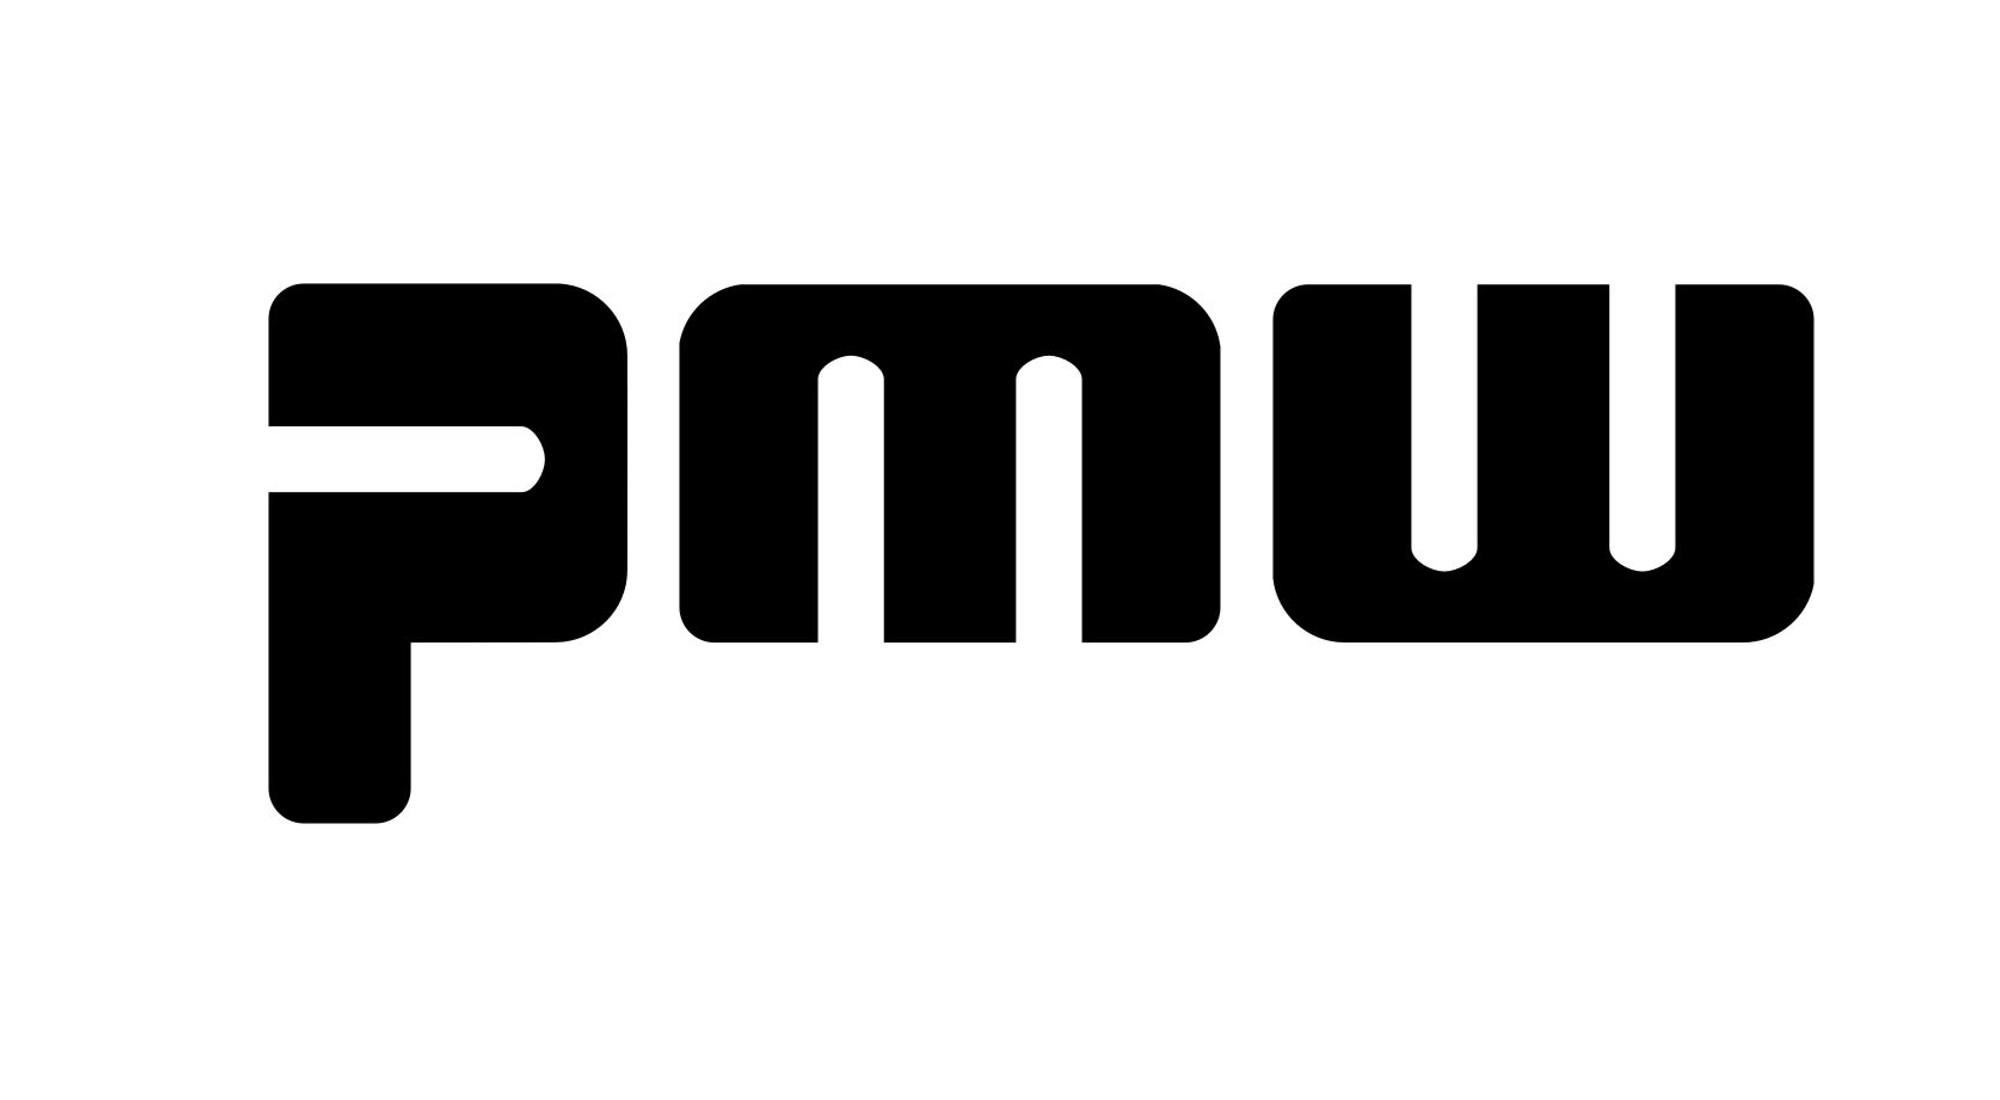 logoppmw